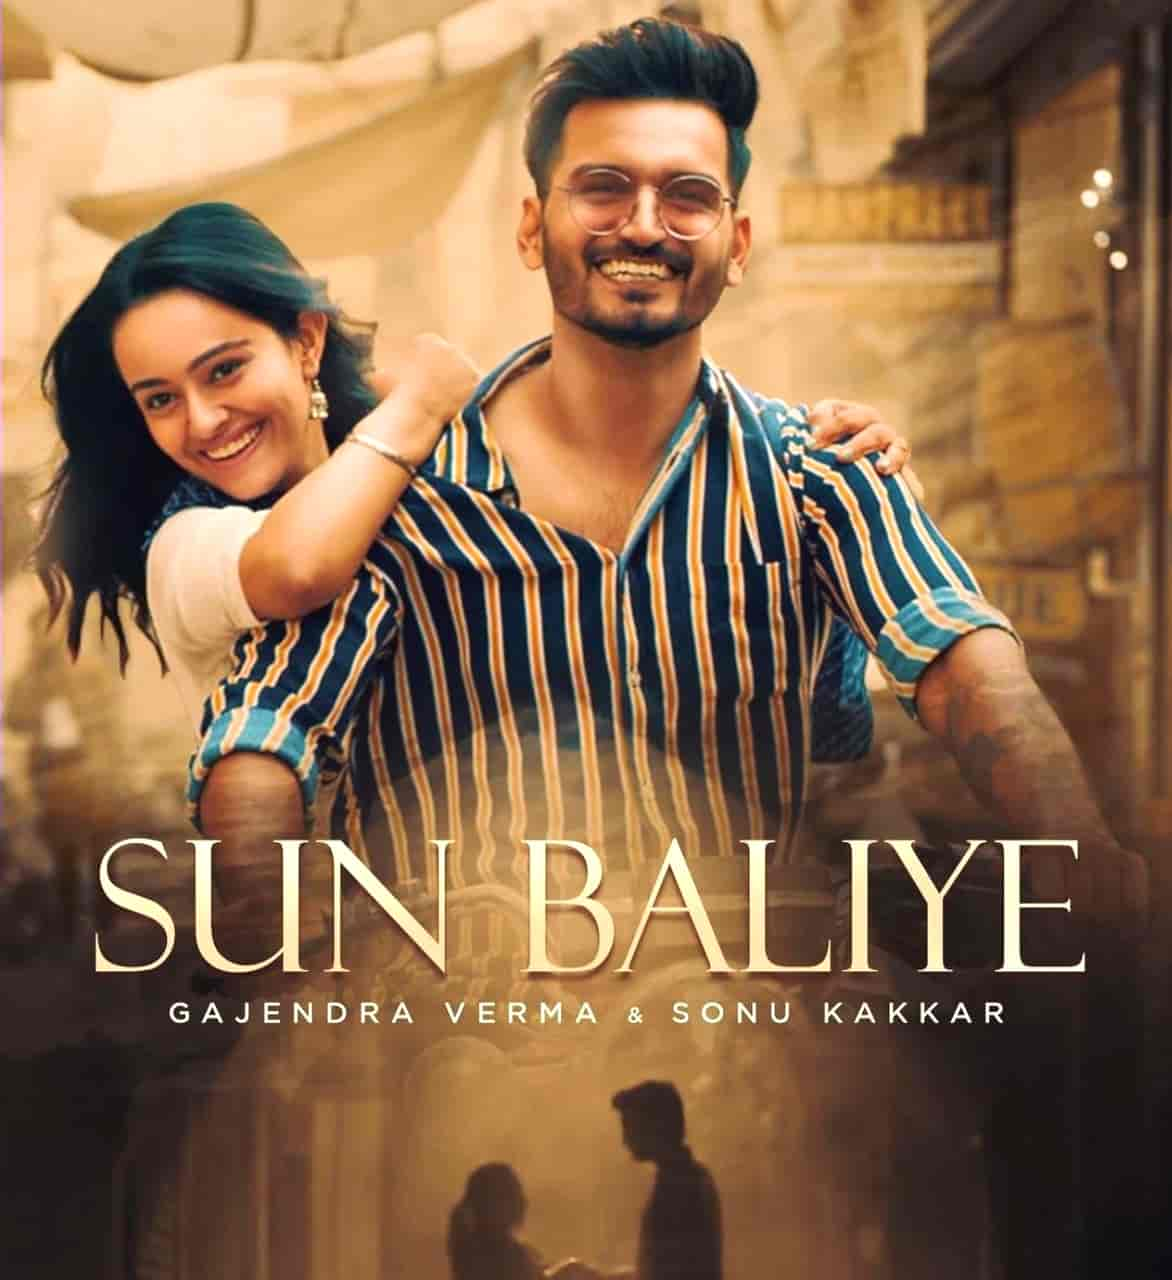 Sun Baliye Hindi Song Image Features Gajendra Verma And Apoorva Arora